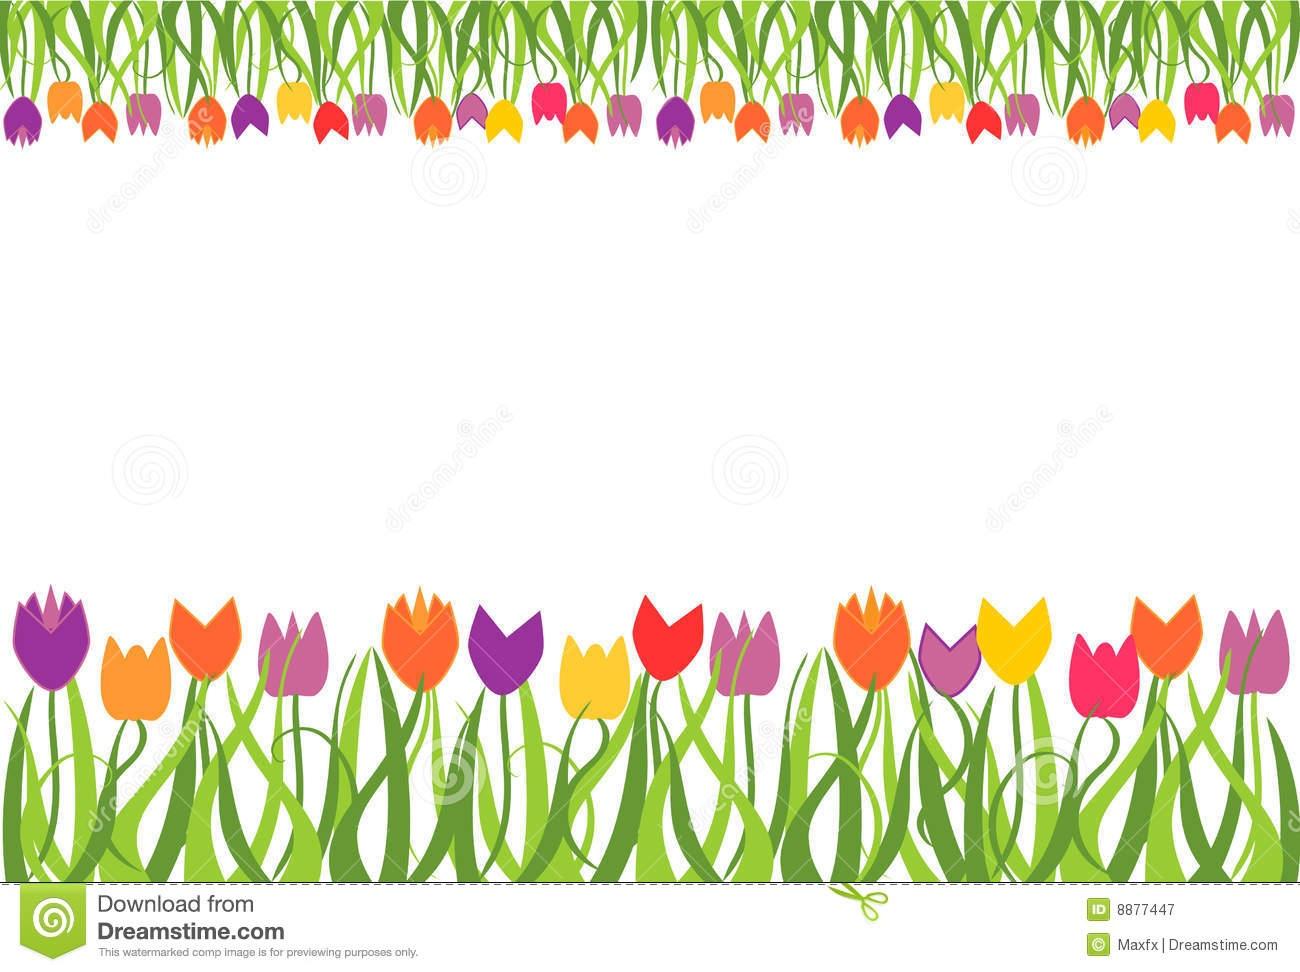 Flower garden border clip art Awesome Tulip Border Clipart.